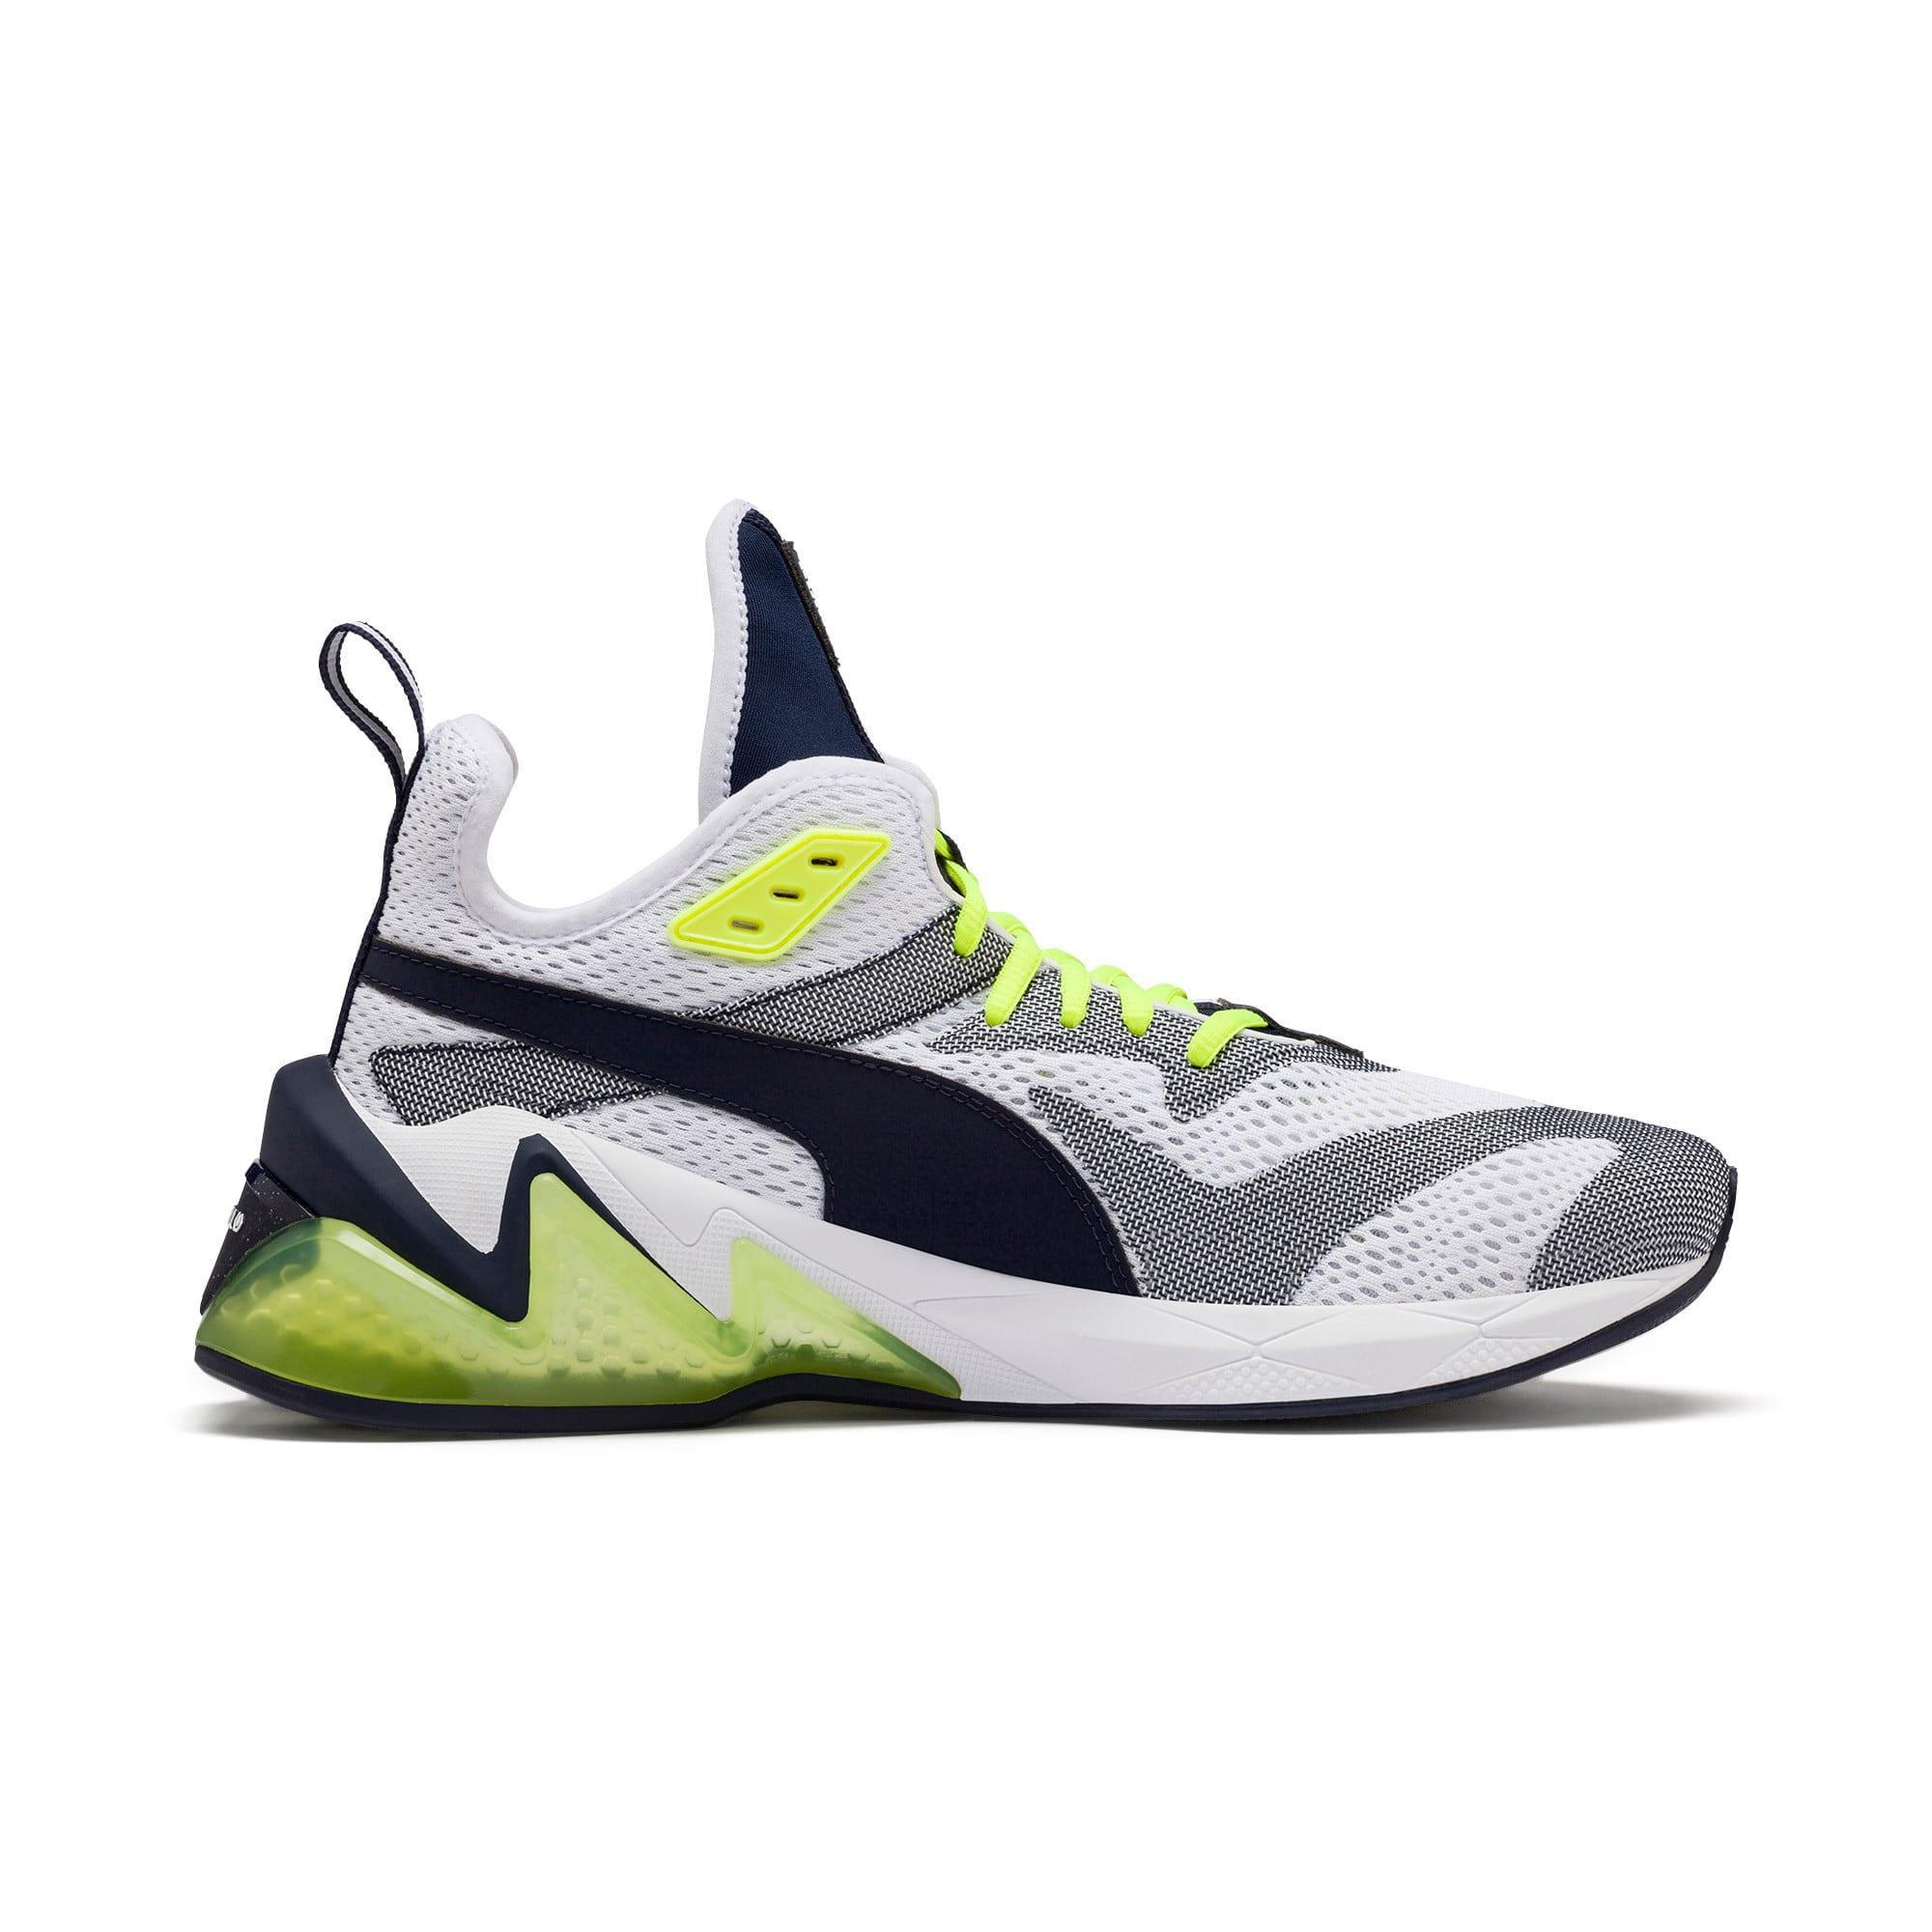 Thumbnail 6 of LQDCELL Origin Tech Men's Shoes, Puma White-Peacoat, medium